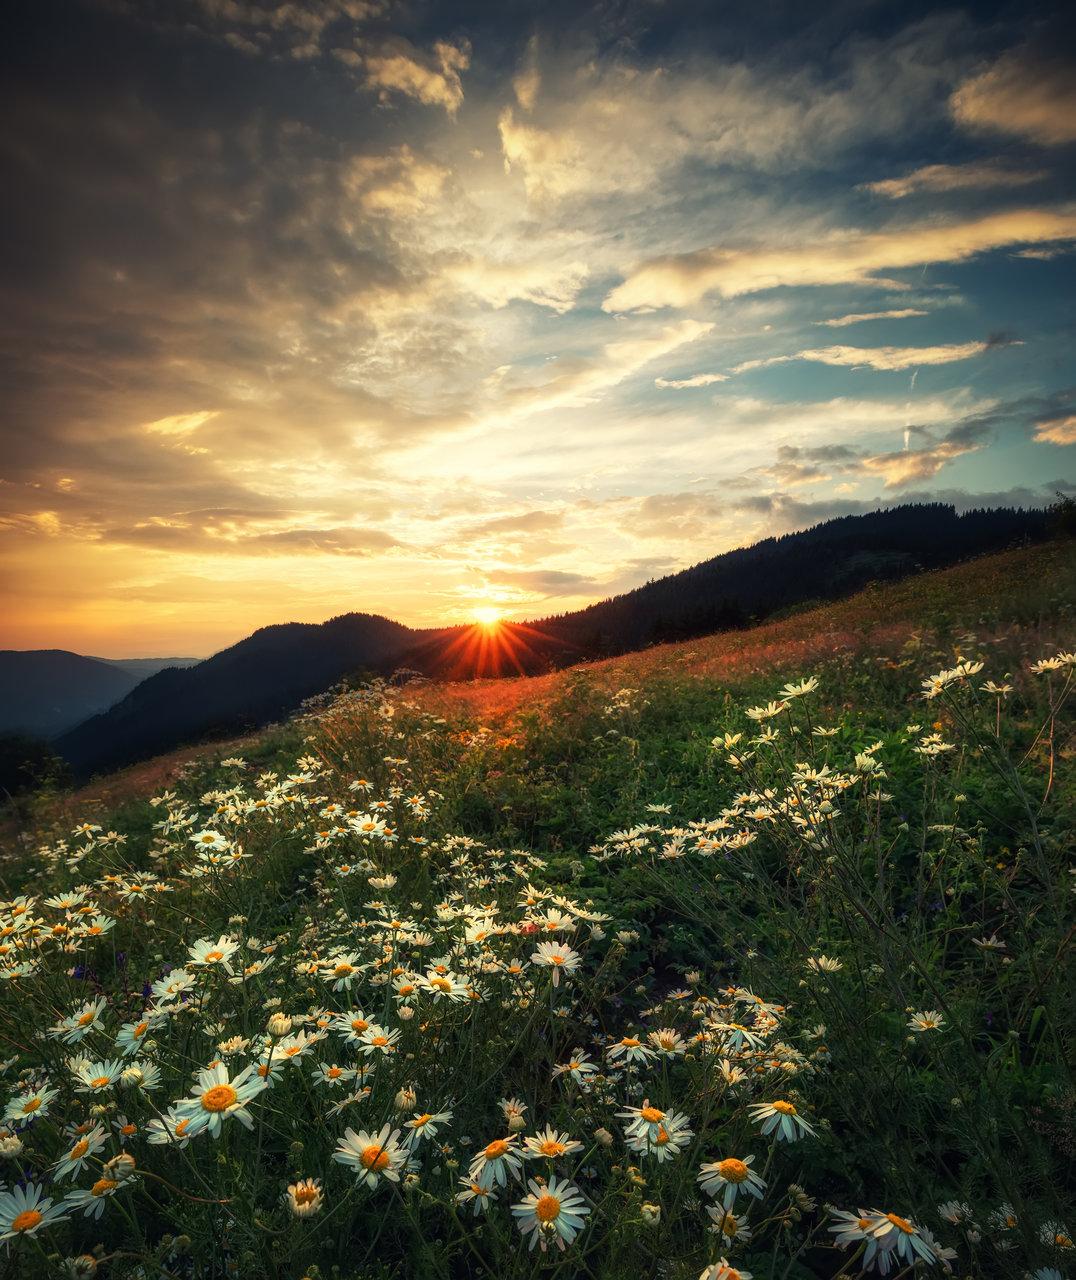 Photo in Landscape | Author _koko_ | PHOTO FORUM